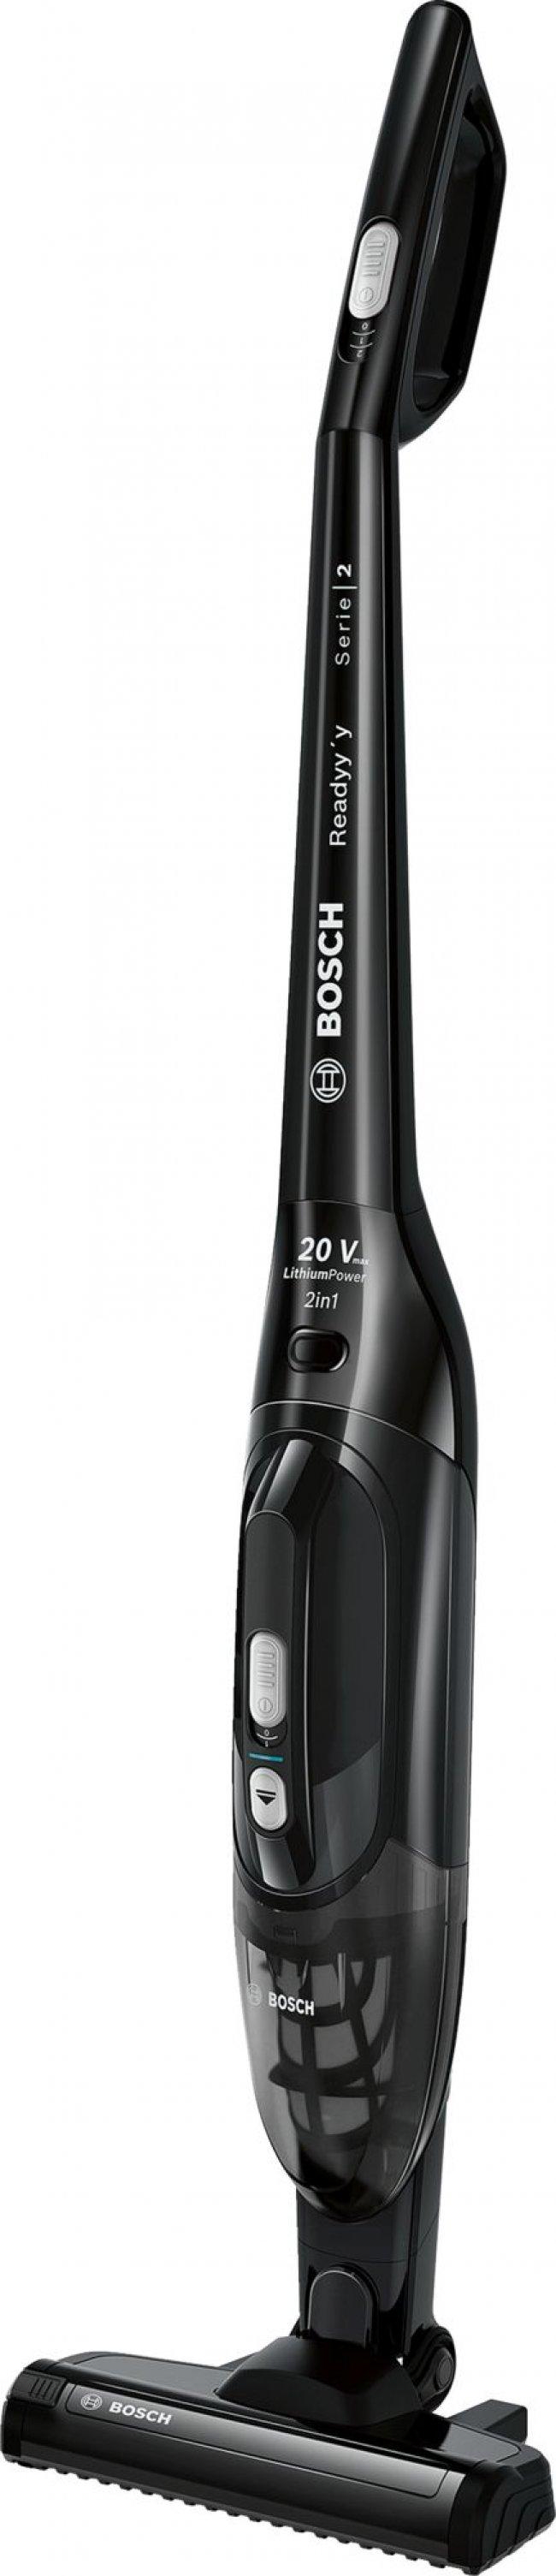 Прахосмукачка Bosch BBHF220